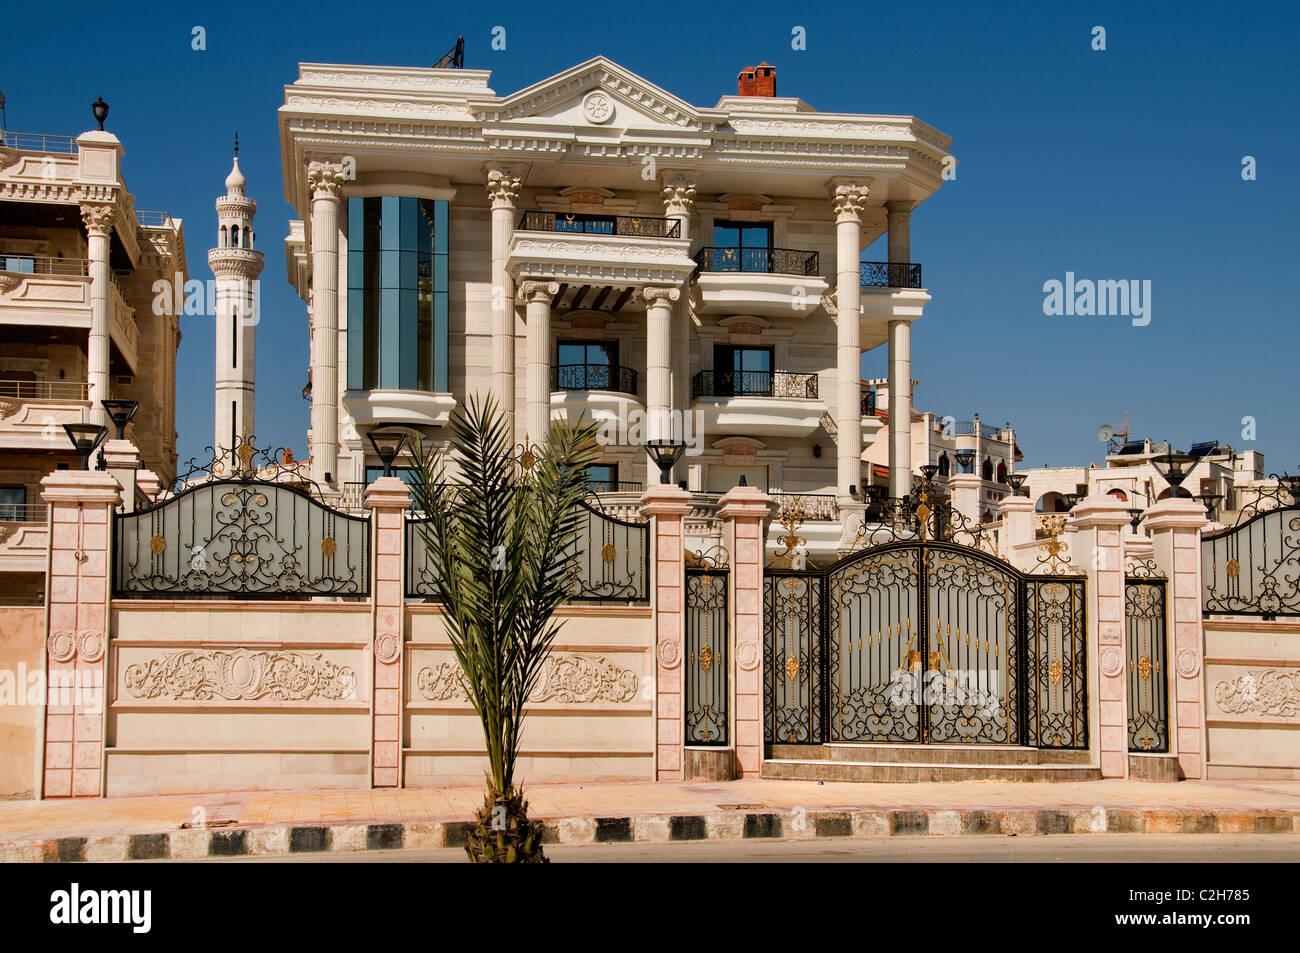 Hama Syrien teure Haus Villa wohlhabenden Familie Stockbild